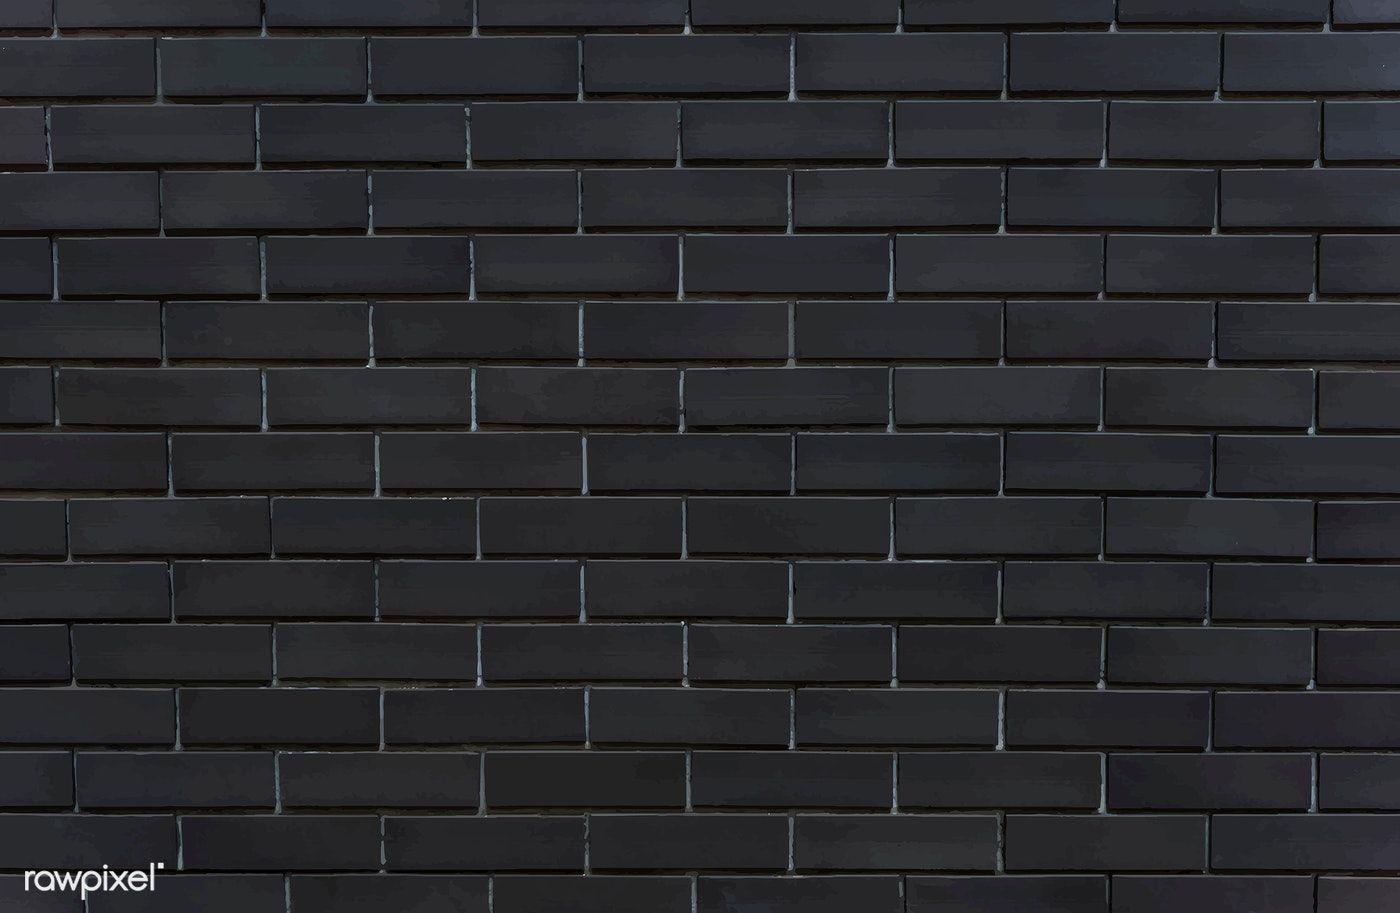 Download Premium Vector Of Black Brick Wall Textured Background 514107 Black Brick Wall Black Brick Brick Wall